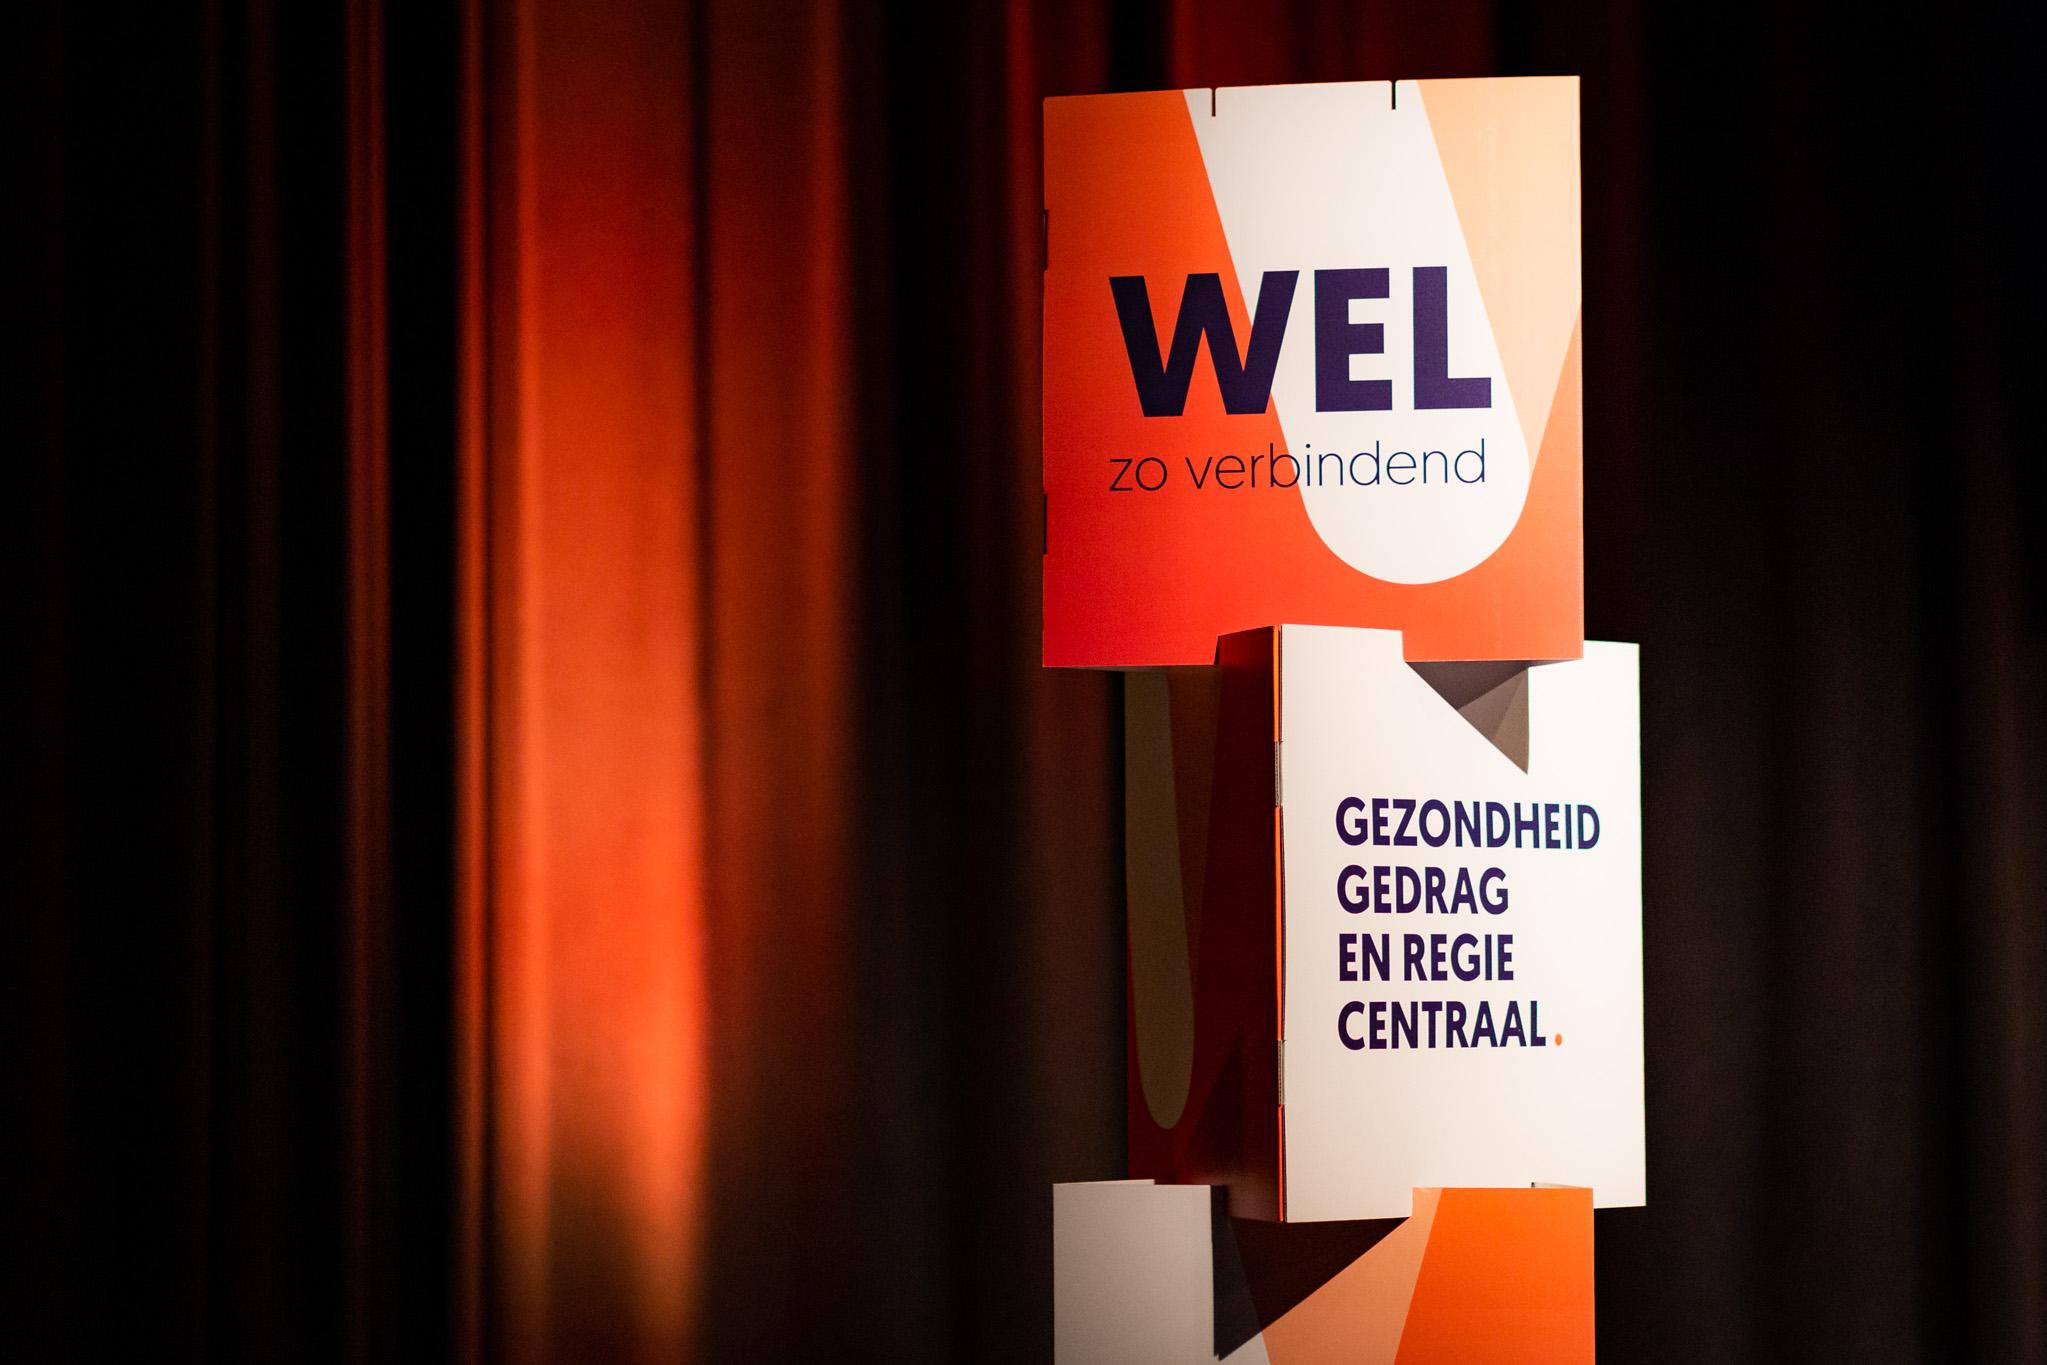 Bedrijf Reportage Positieve Gezondheid Flevoland Shot By Sylla 33